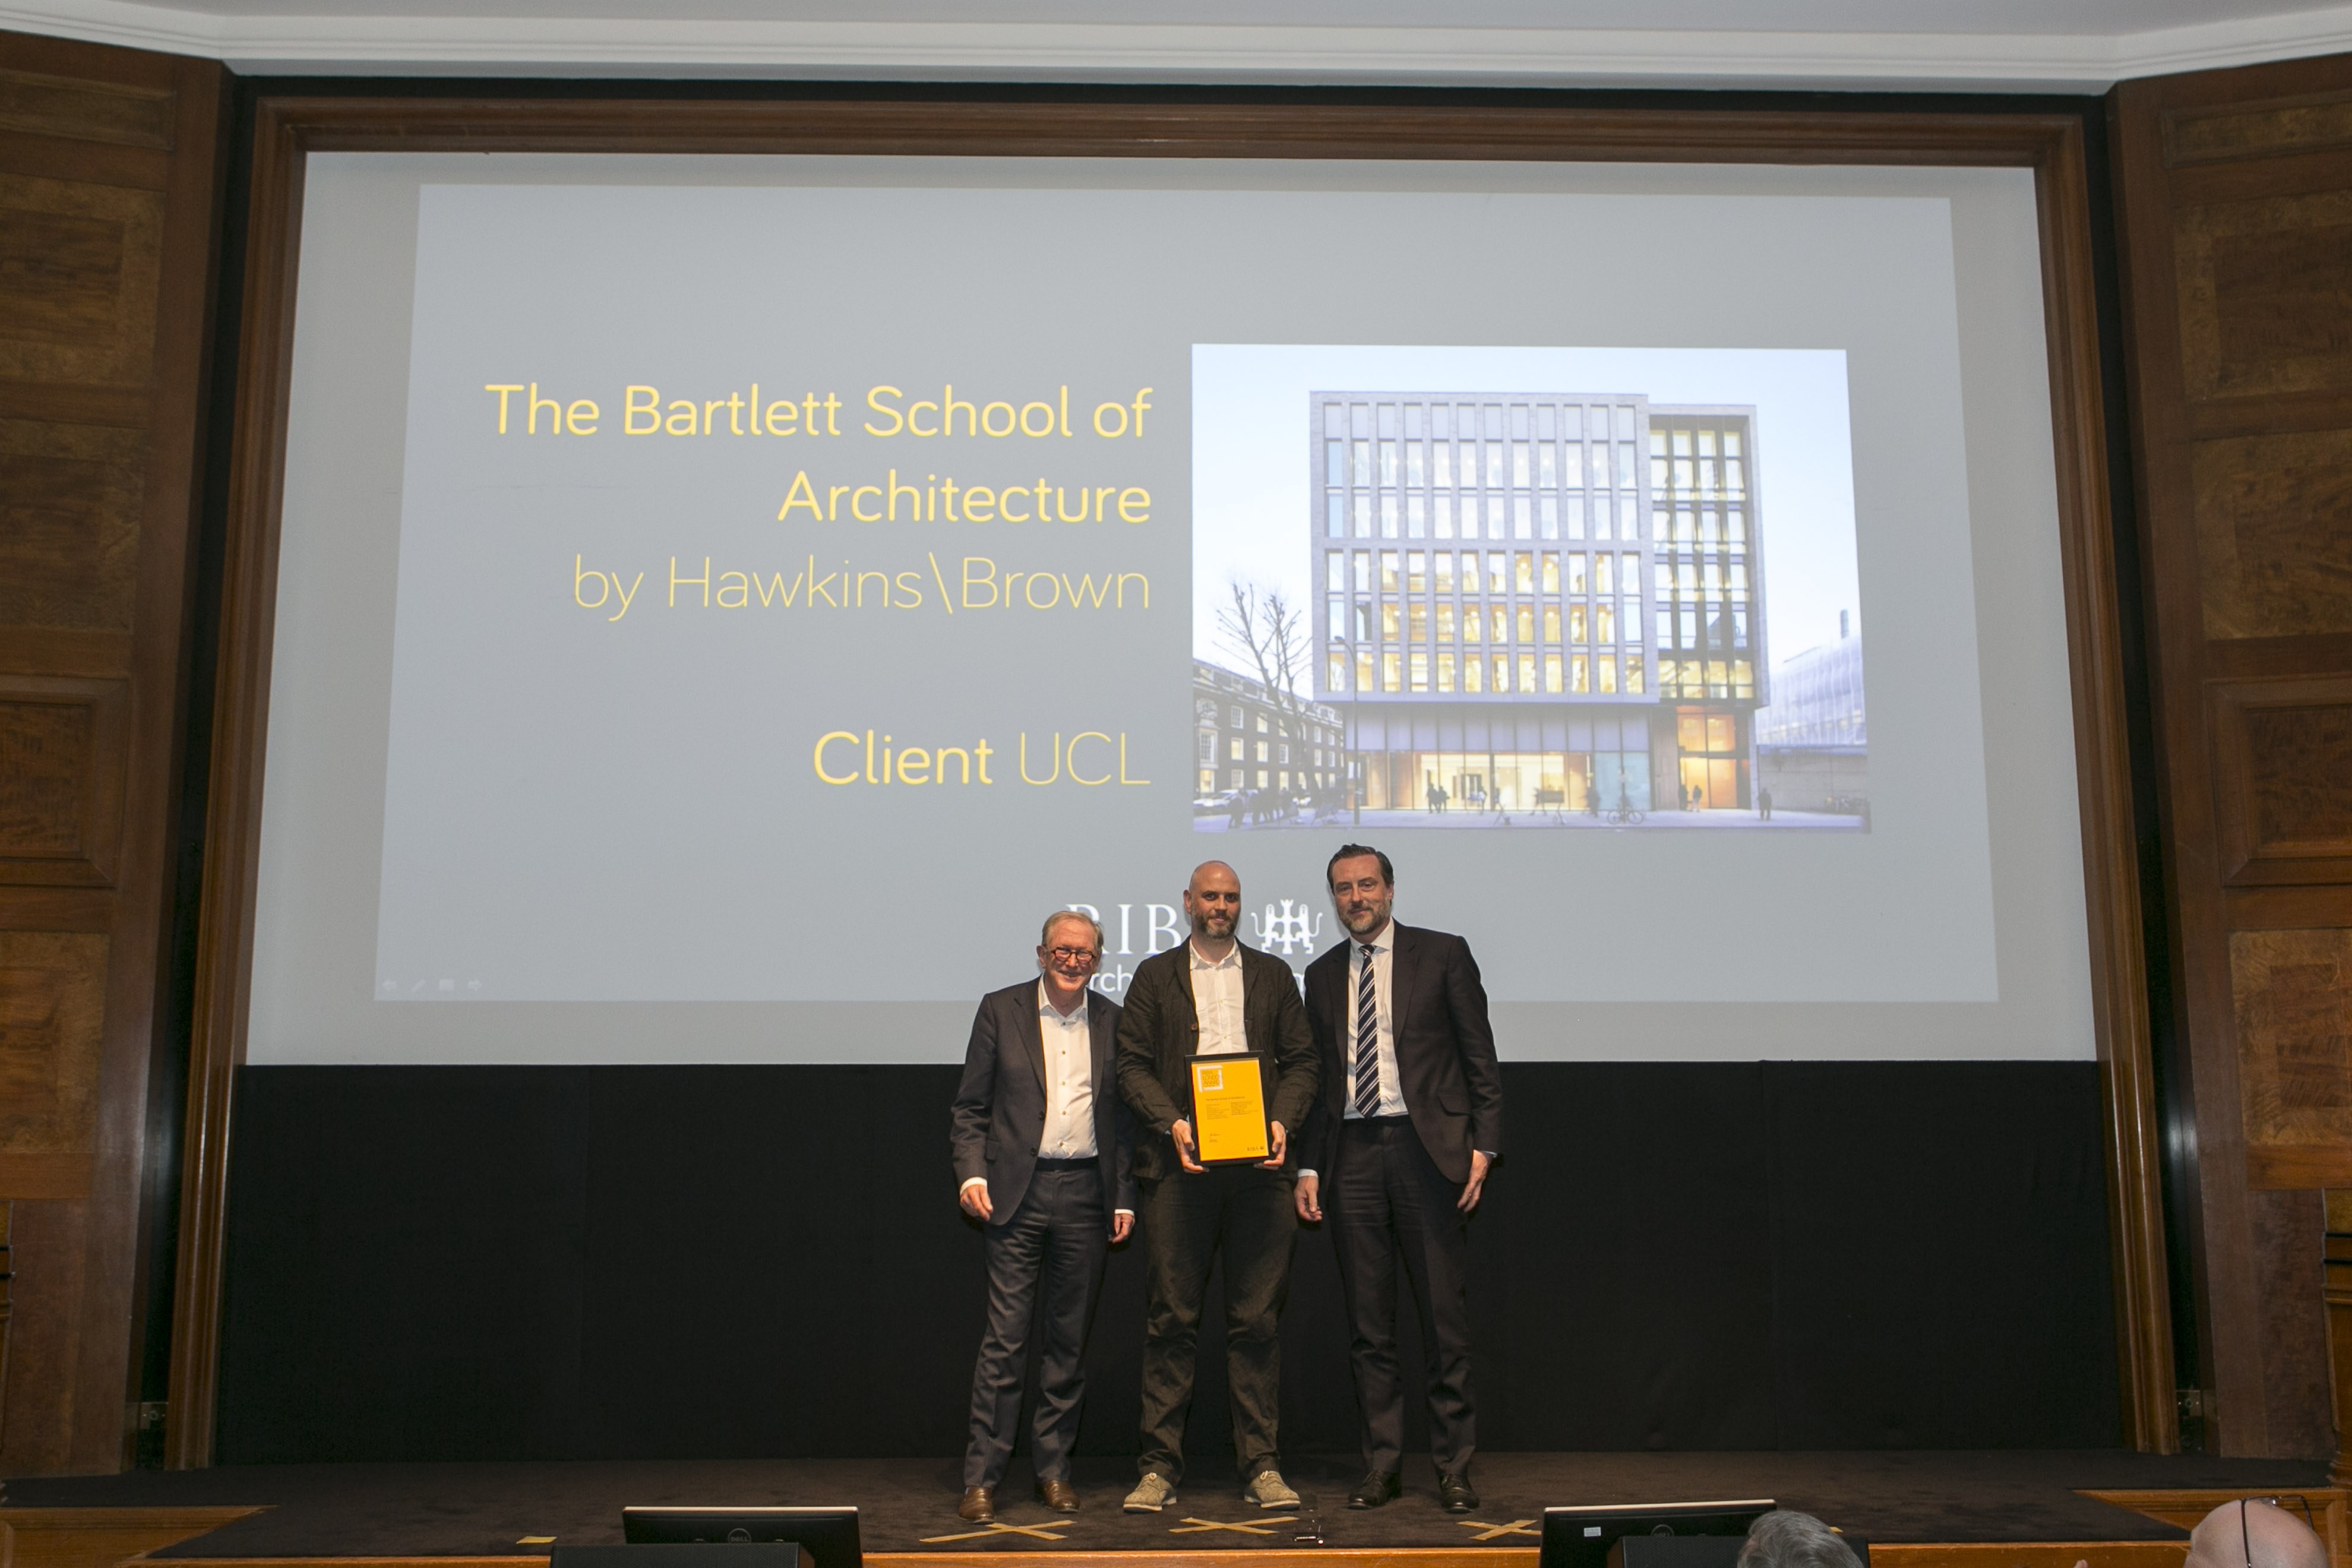 Kevin Argent and Euan Macdonald collect RIBA award for 22 Gordon Street. Image credit: Agnese Sanvito